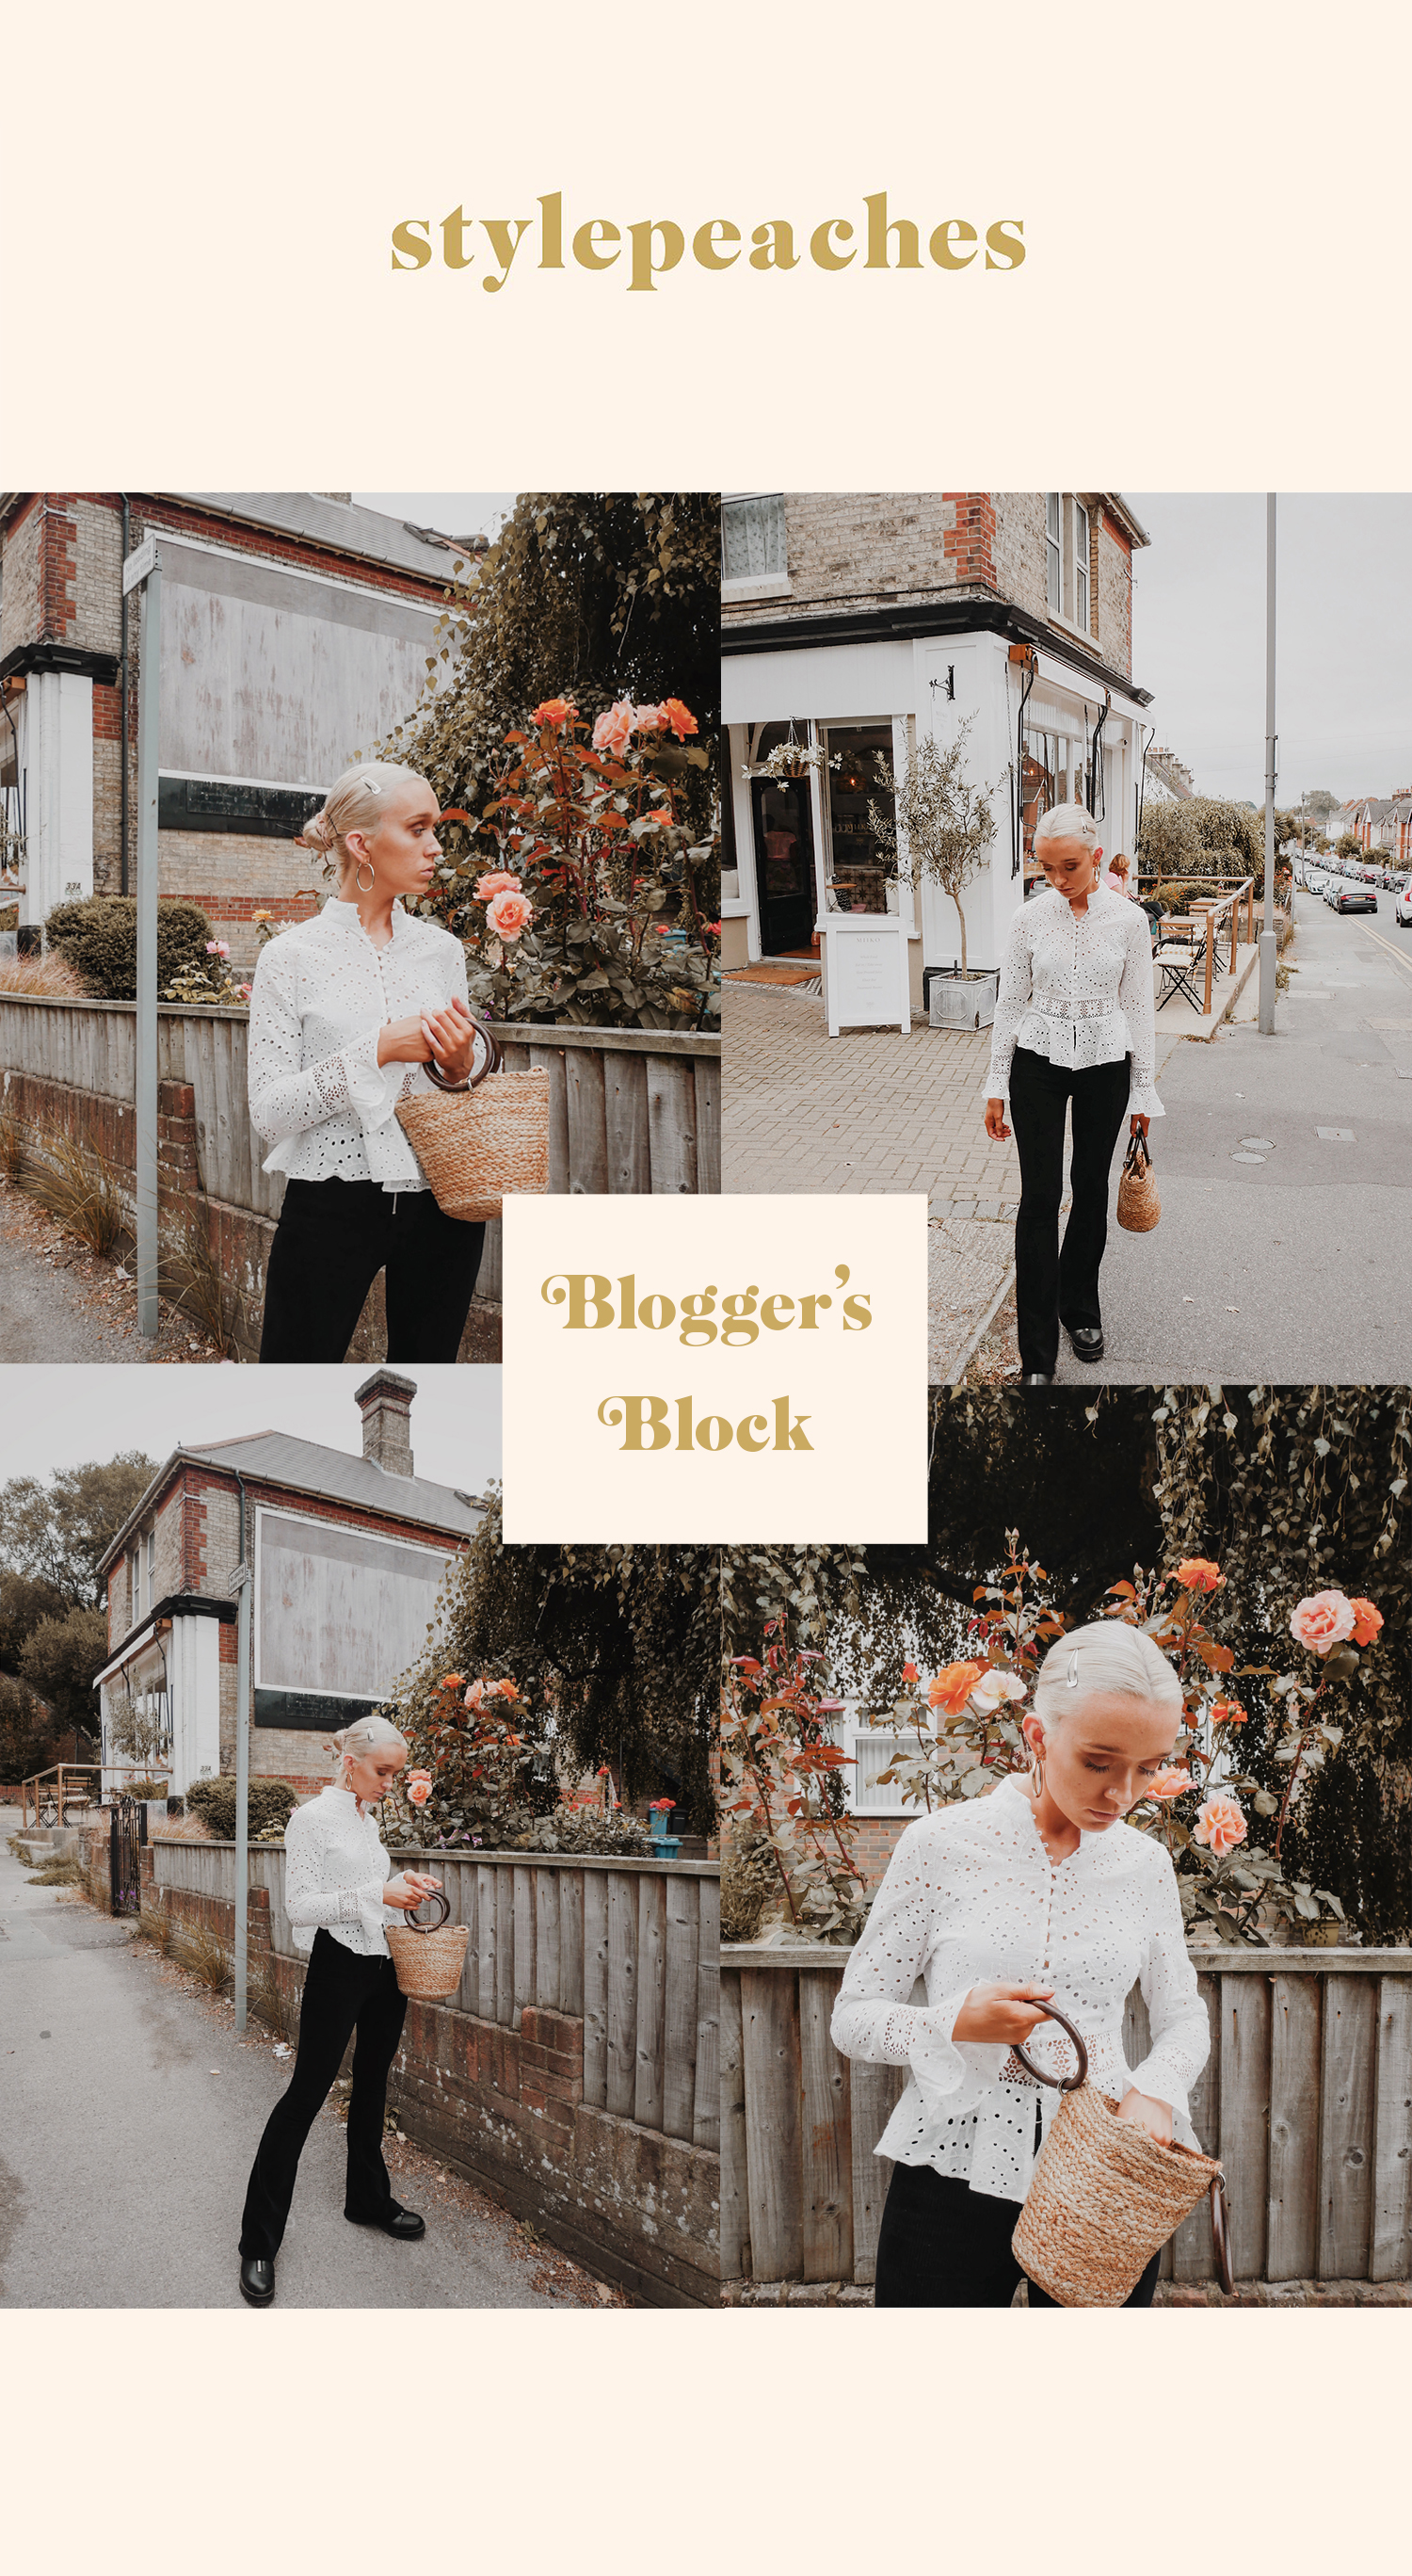 blogger's block-stylepeaches